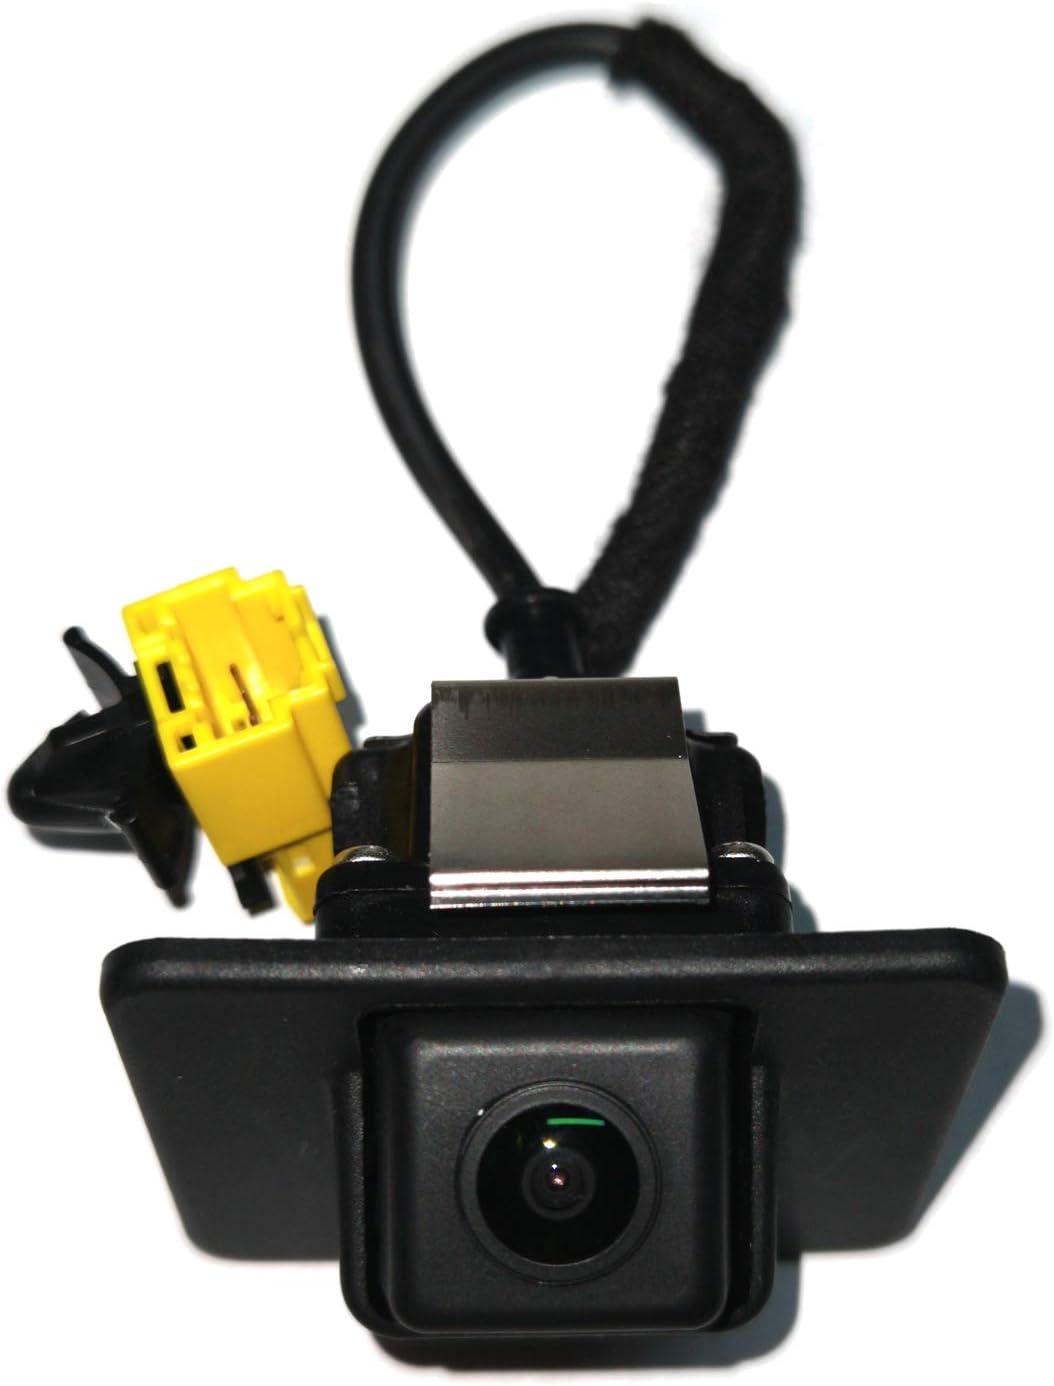 IMAChoice Rear View Backup Parking Camera fit for KIA Optima Hybrid EX LX SX SXL 2011-2013 2.0L 2.4L 95760-2T001